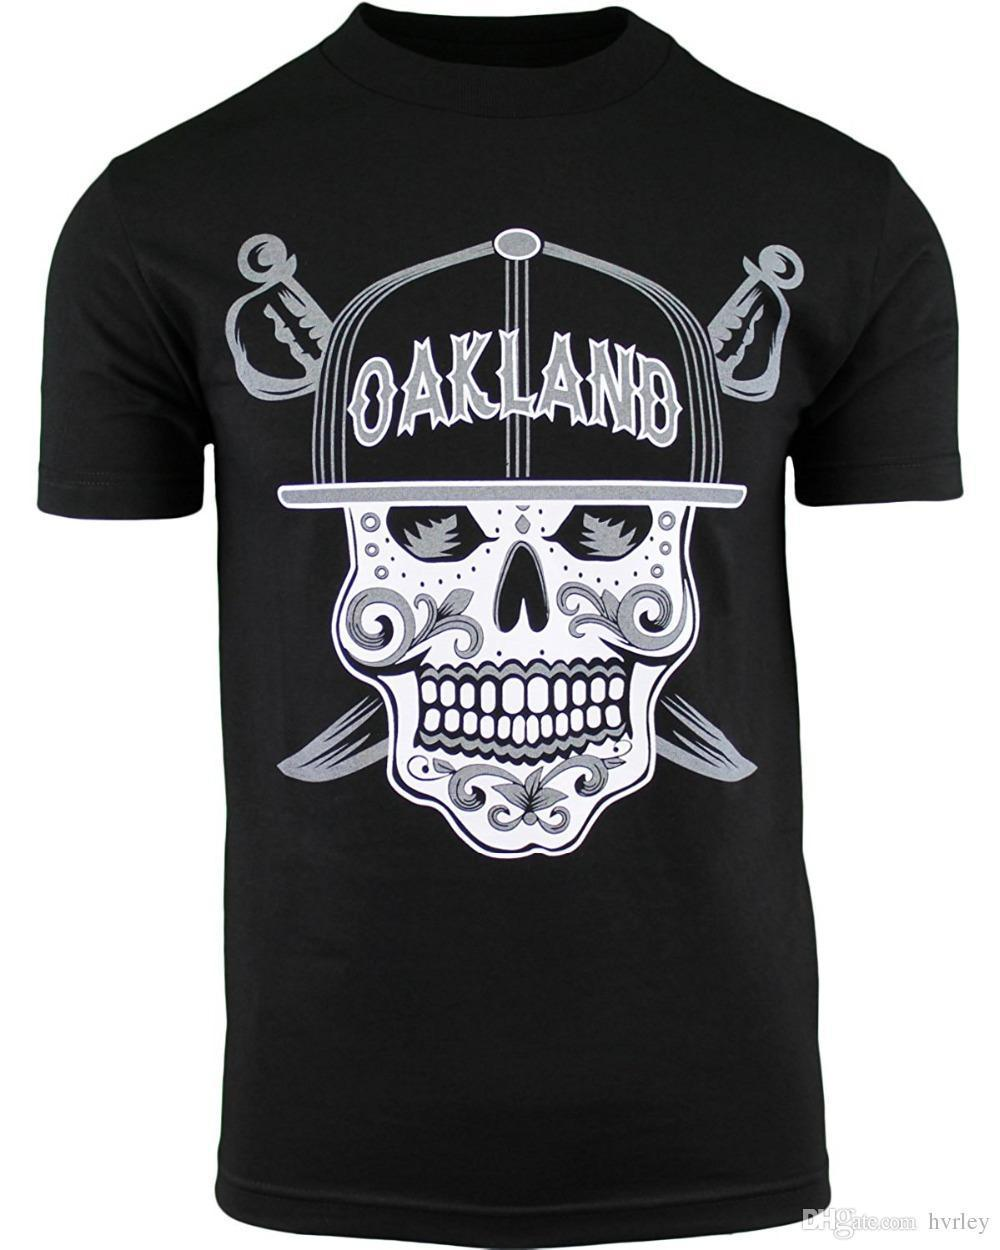 Dag Man Oakland De Van Casual Schedel Patroon T shirt Suiker Dode Mens QxCstrhd